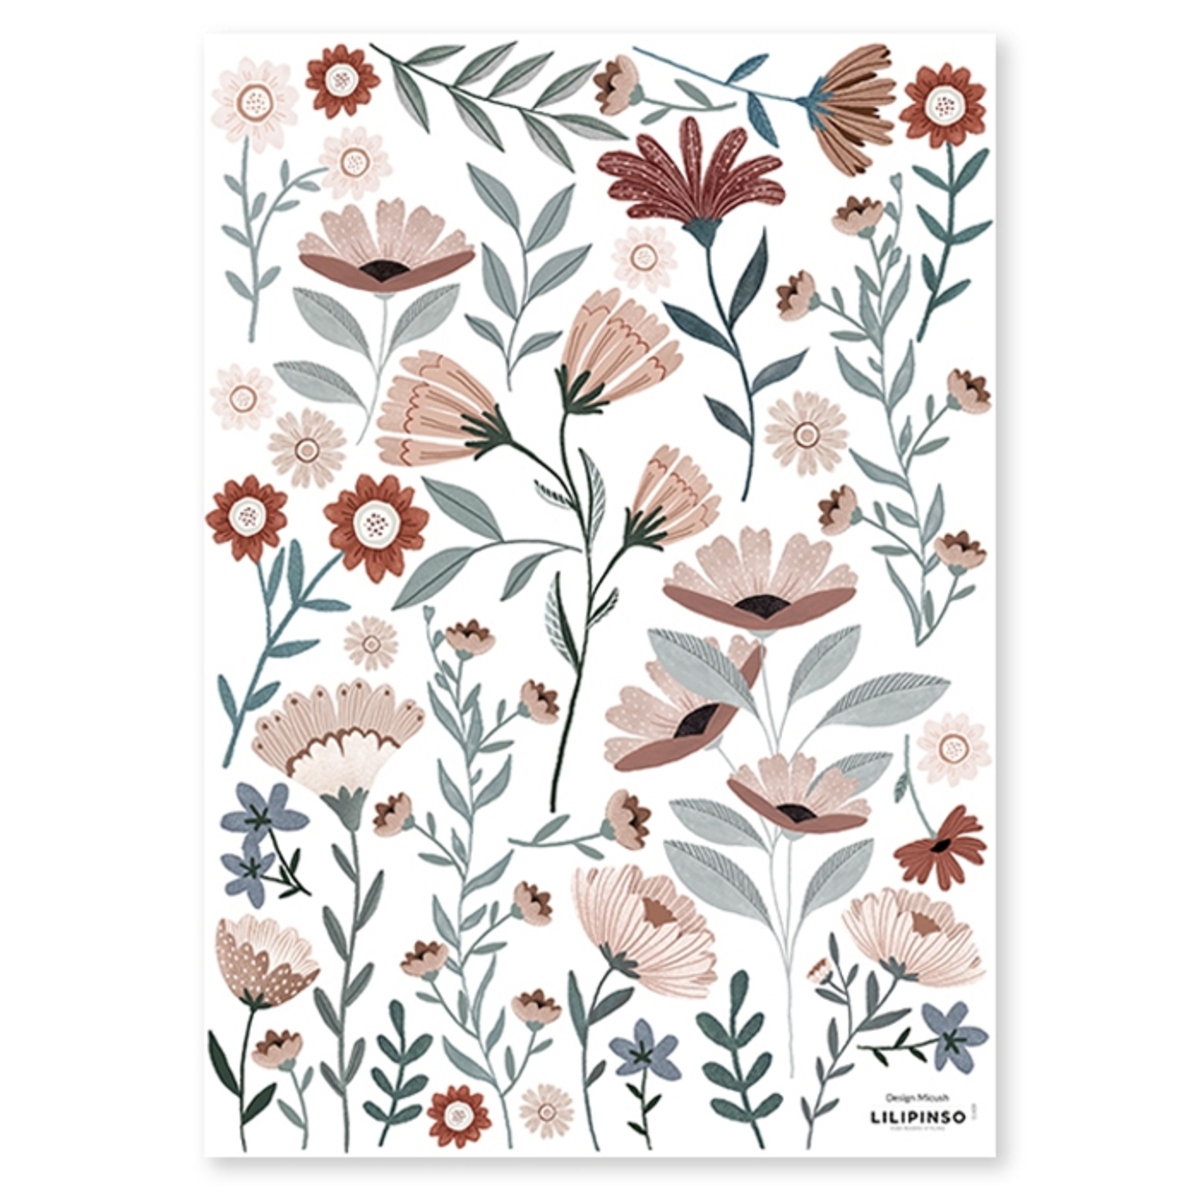 Sticker Planche de Stickers - Ocean Flowers Planche de Stickers - Ocean Flowers